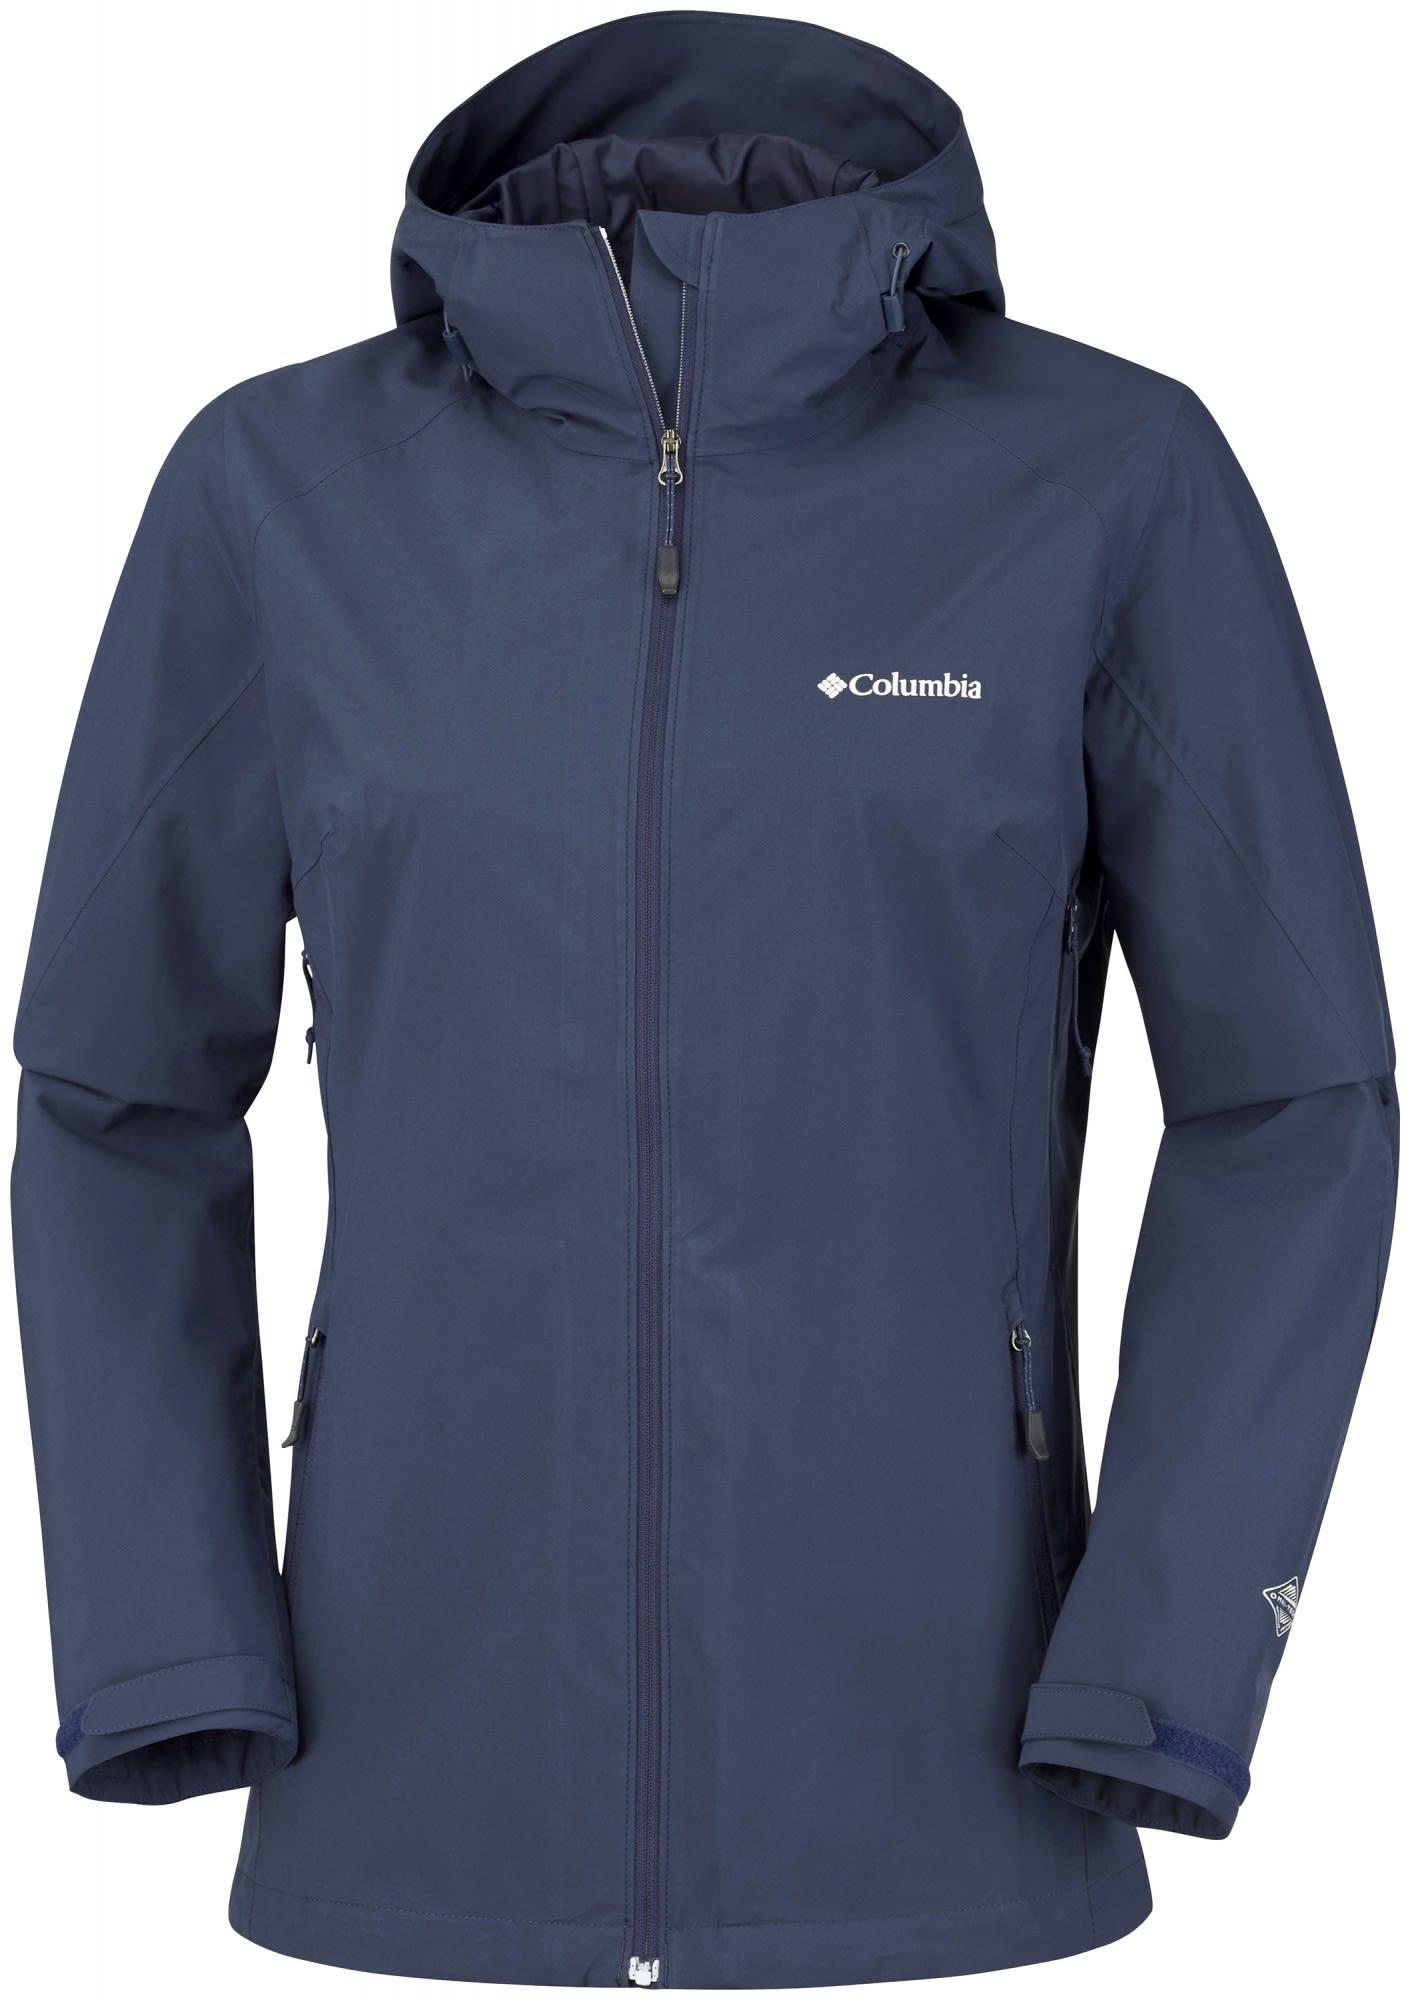 Columbia Trek Light Stretch Jacket Blau, Female Freizeitjacke, M